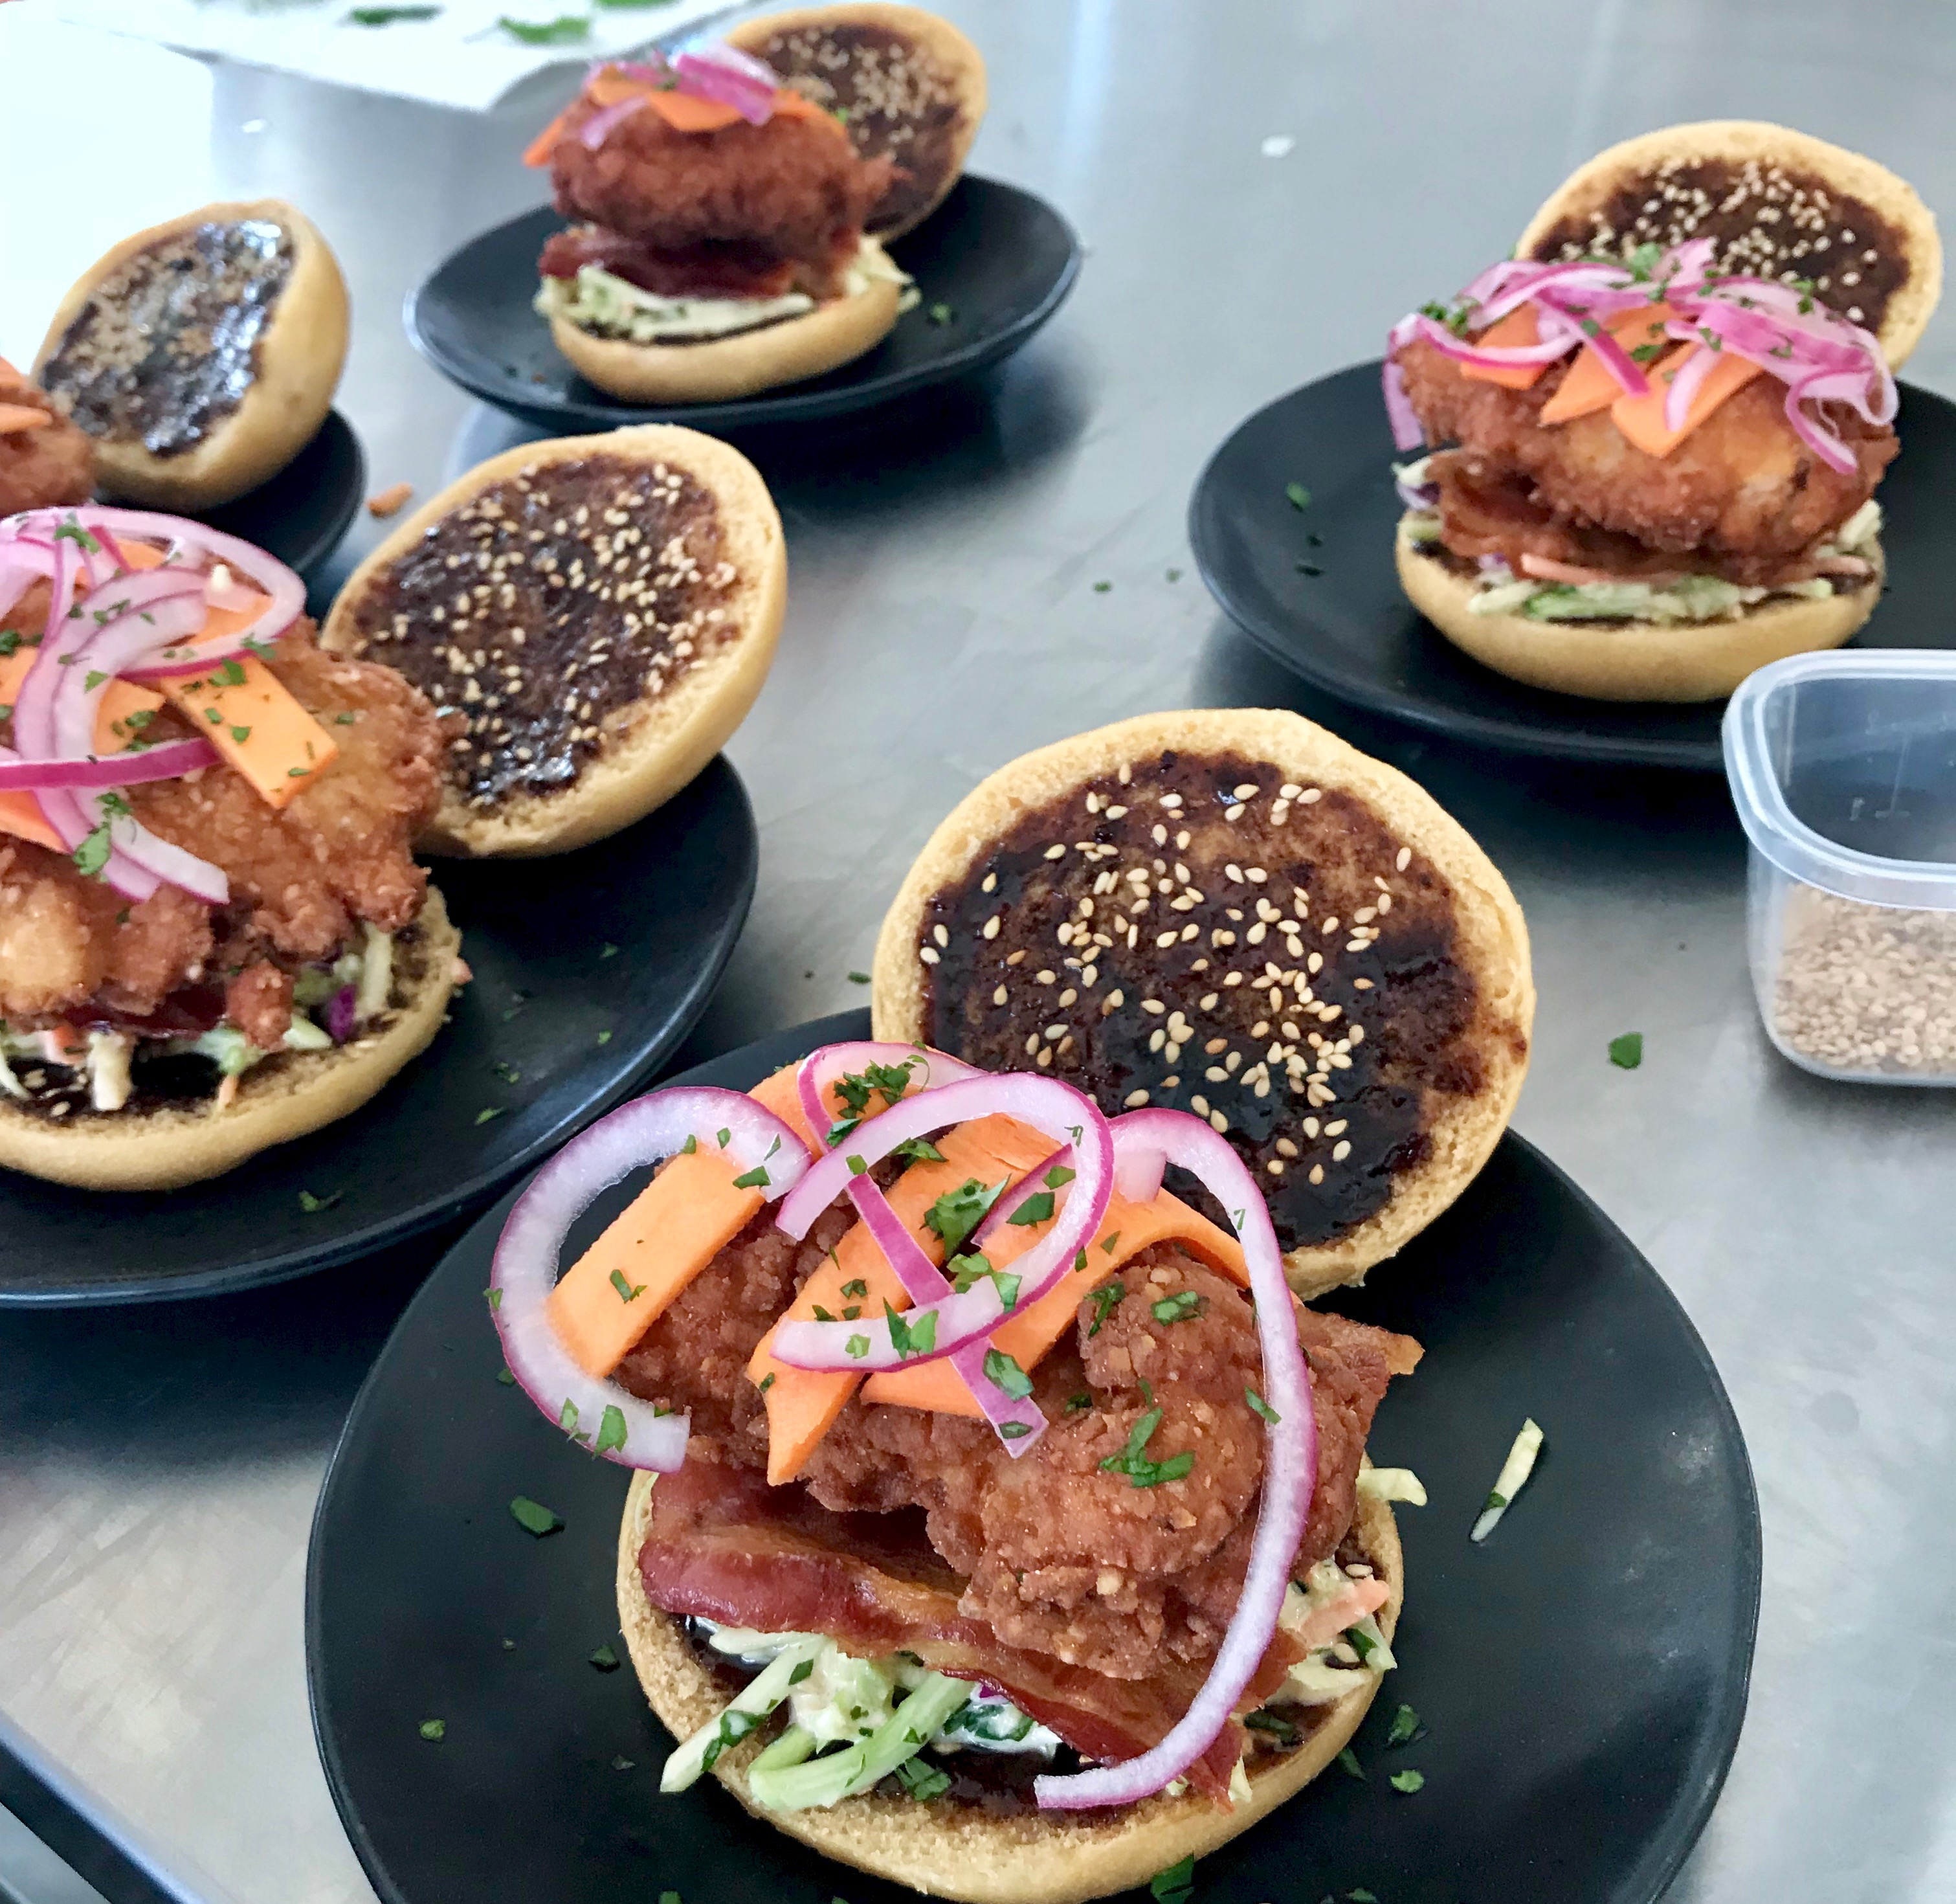 Asian inspired chicken fried sandwich